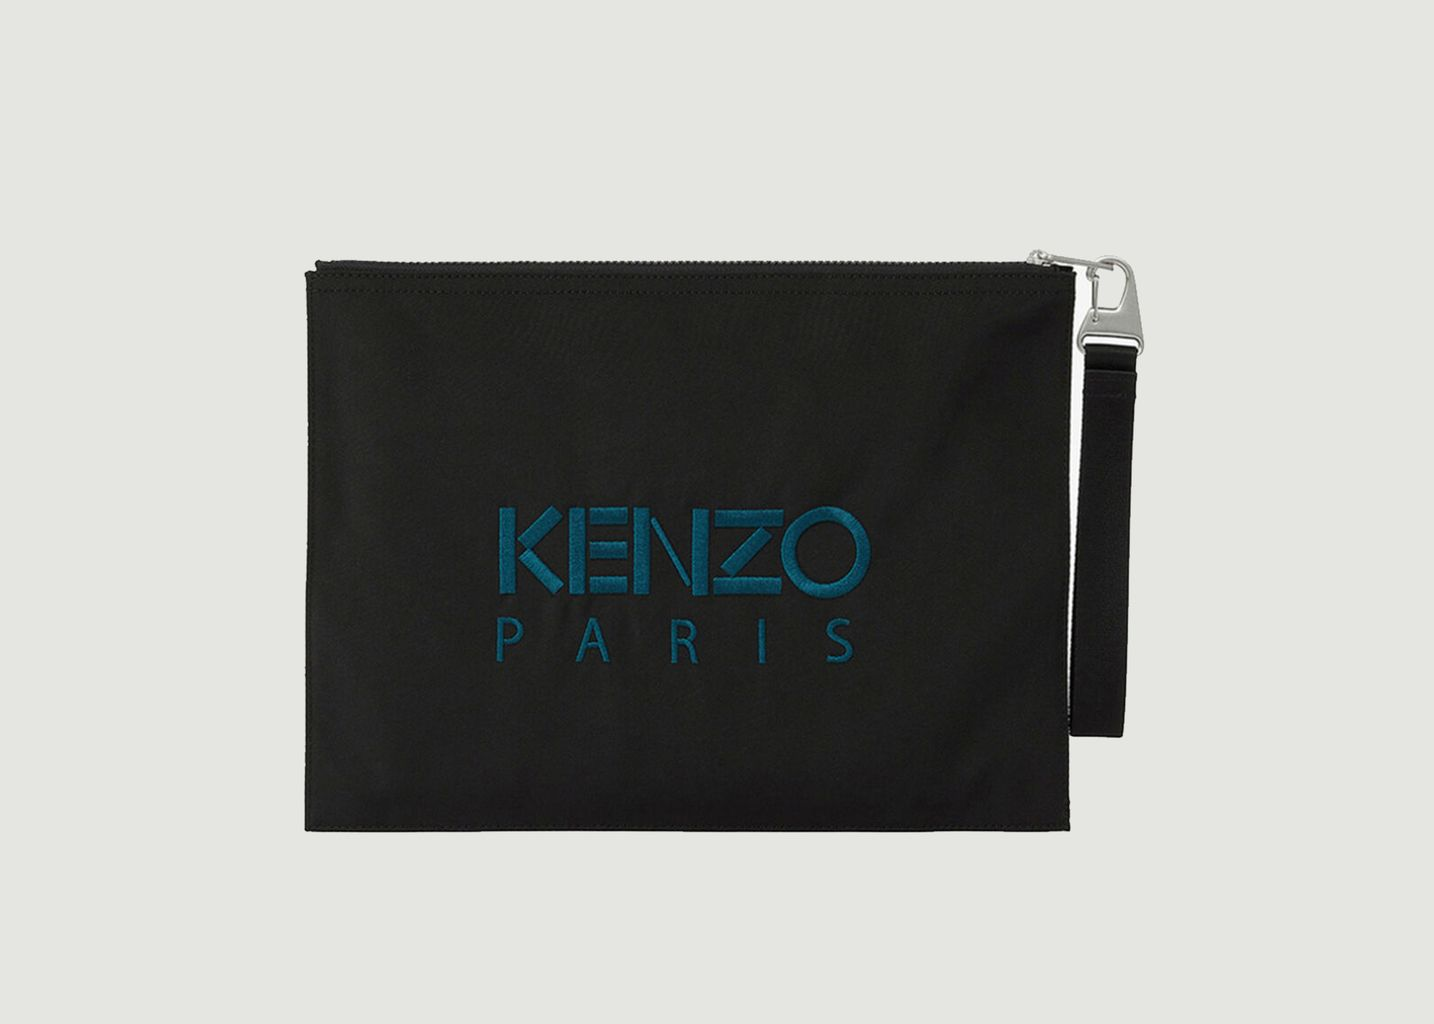 Grande pochette porte-documents zippée siglée en toile - Kenzo